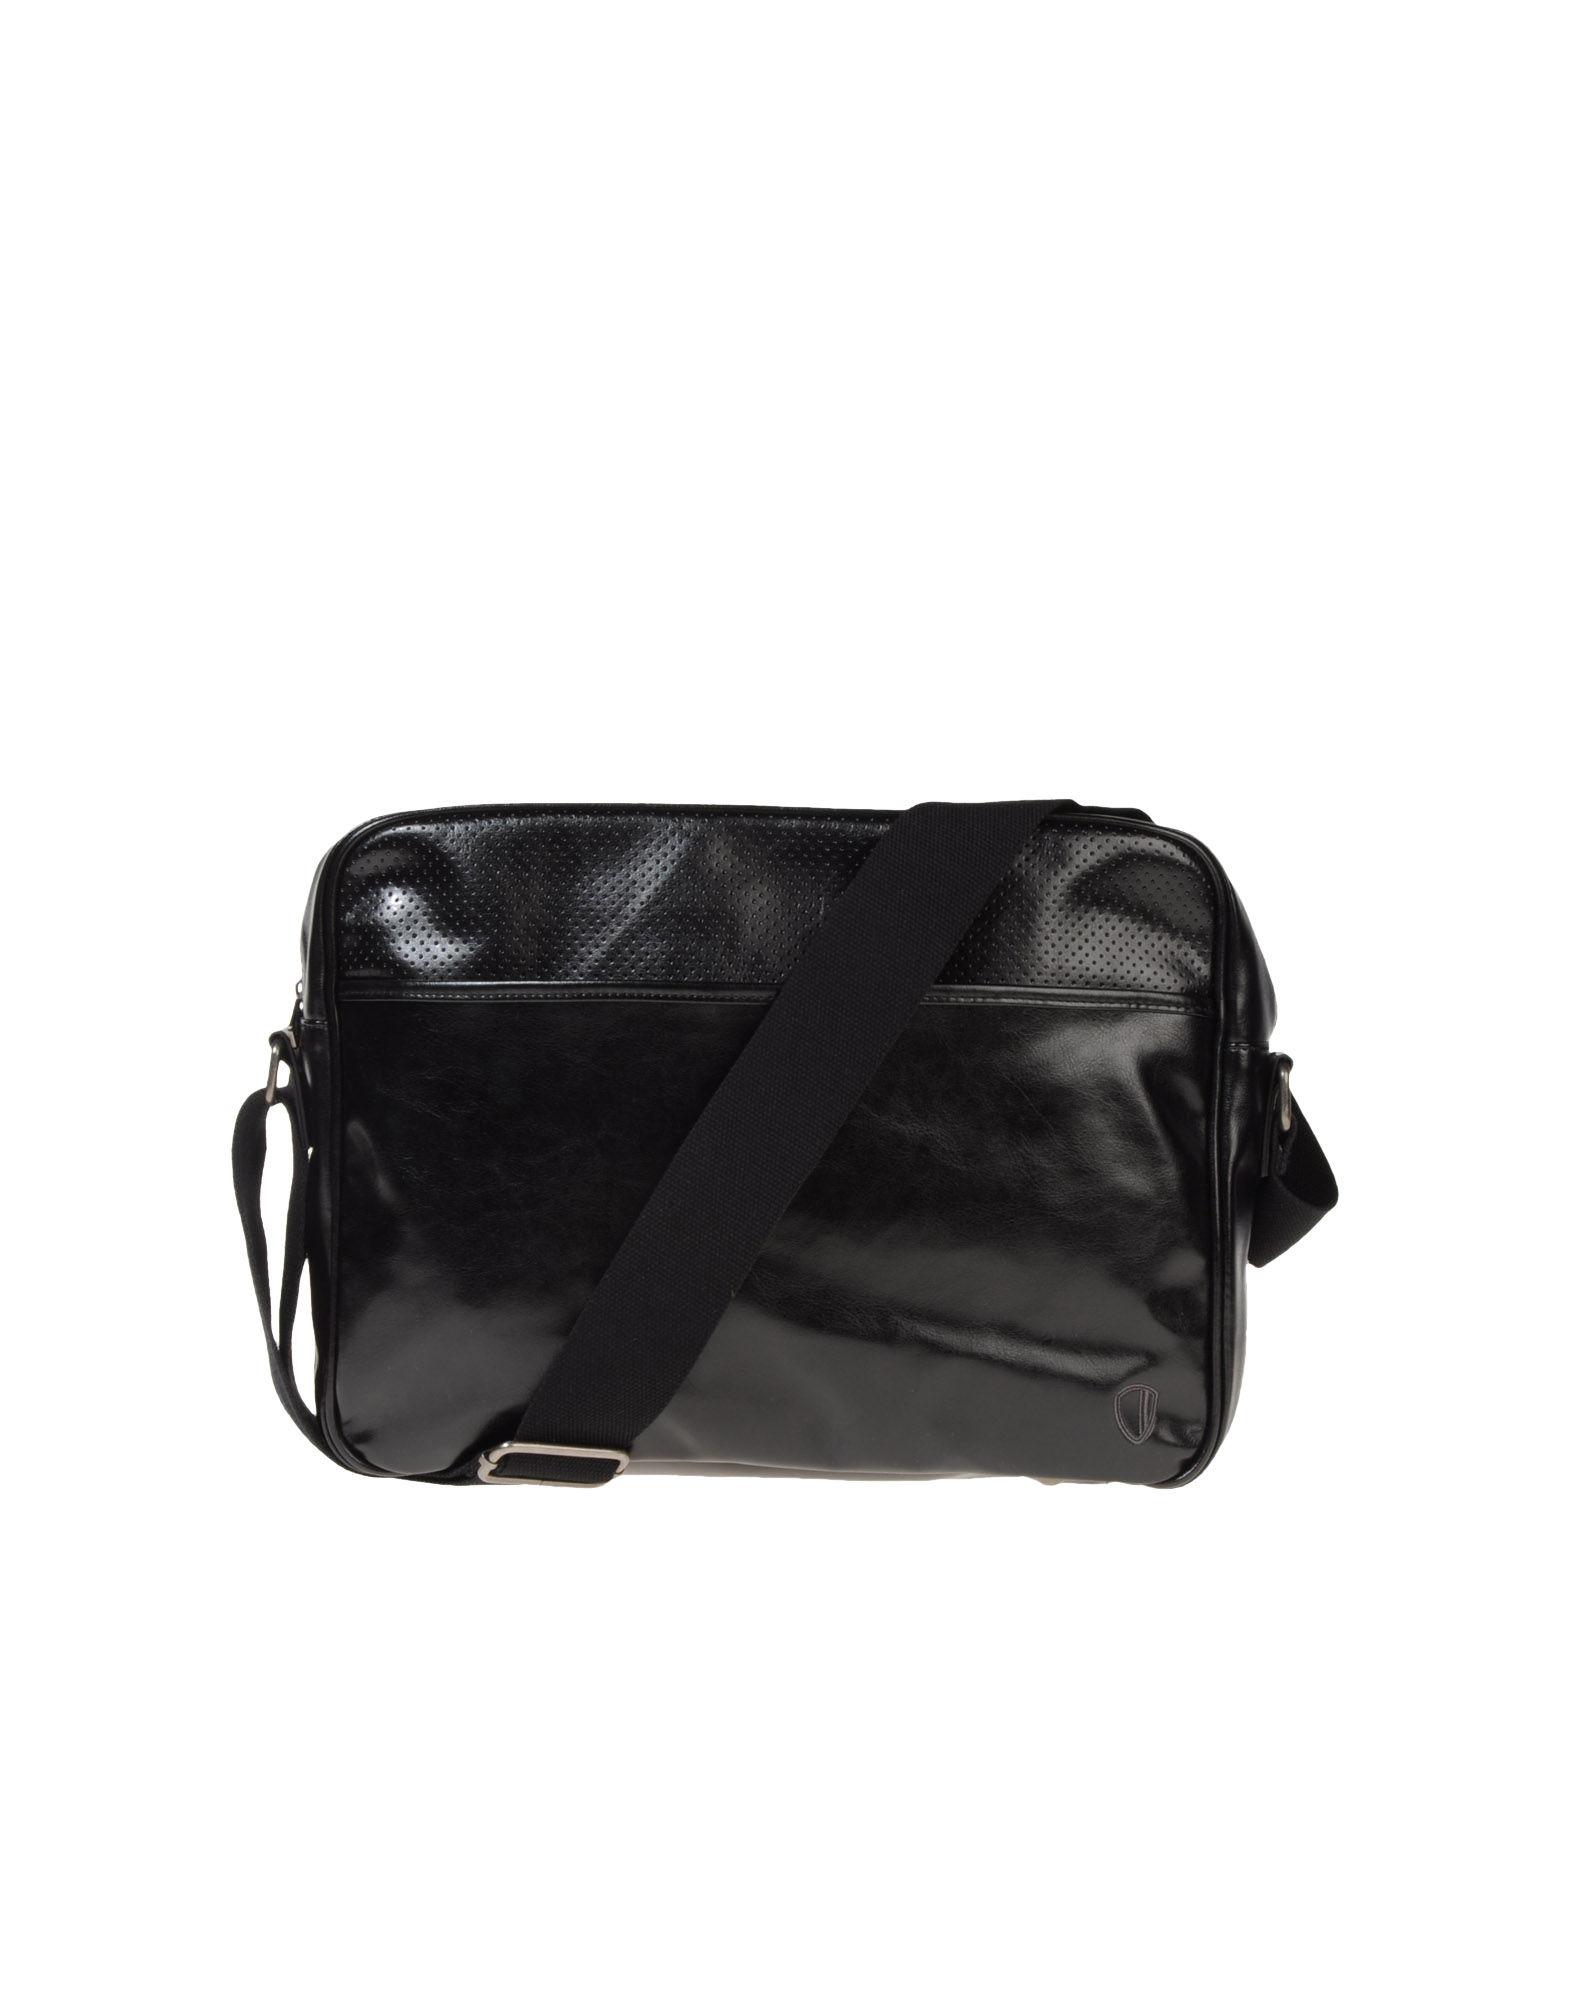 Ben Sherman Medium Fabric Bag in Black for Men - Lyst 0f343a1f31673